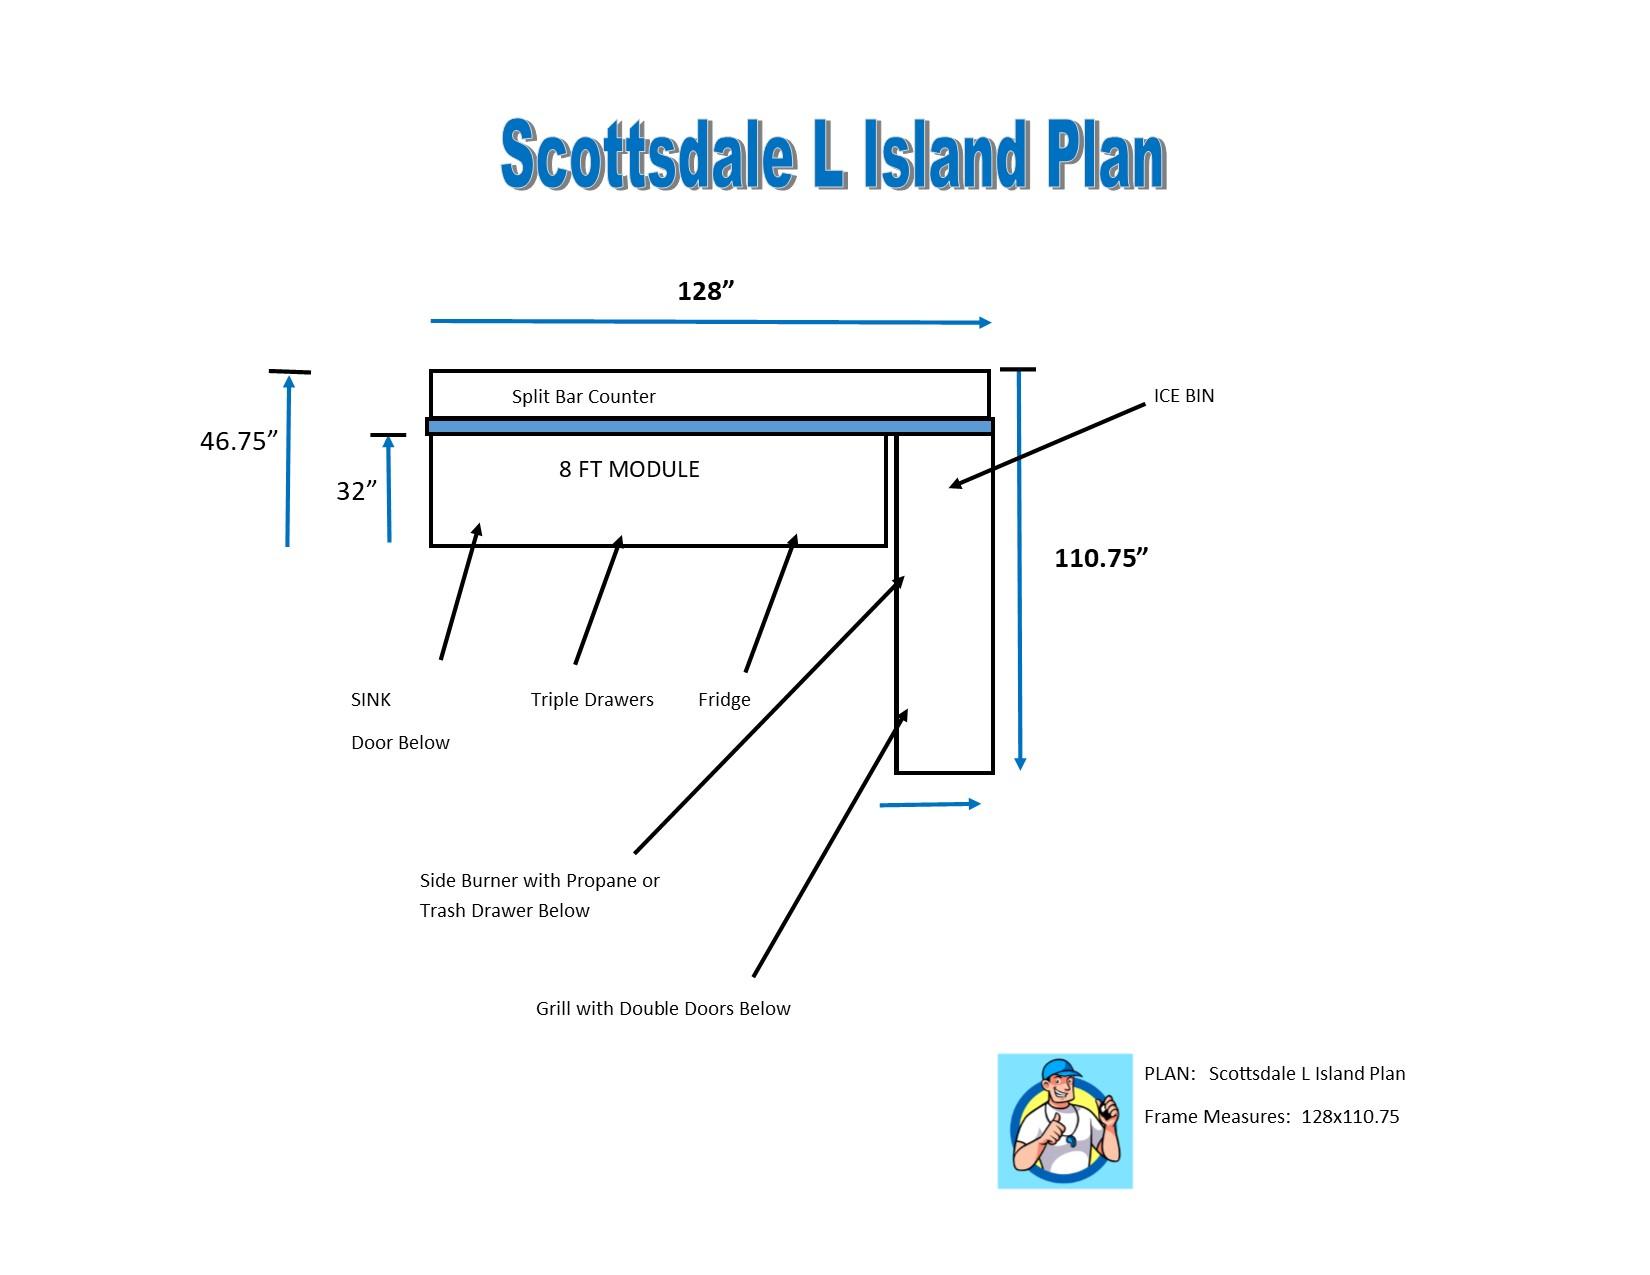 scottsdale-l-island-plan.jpg